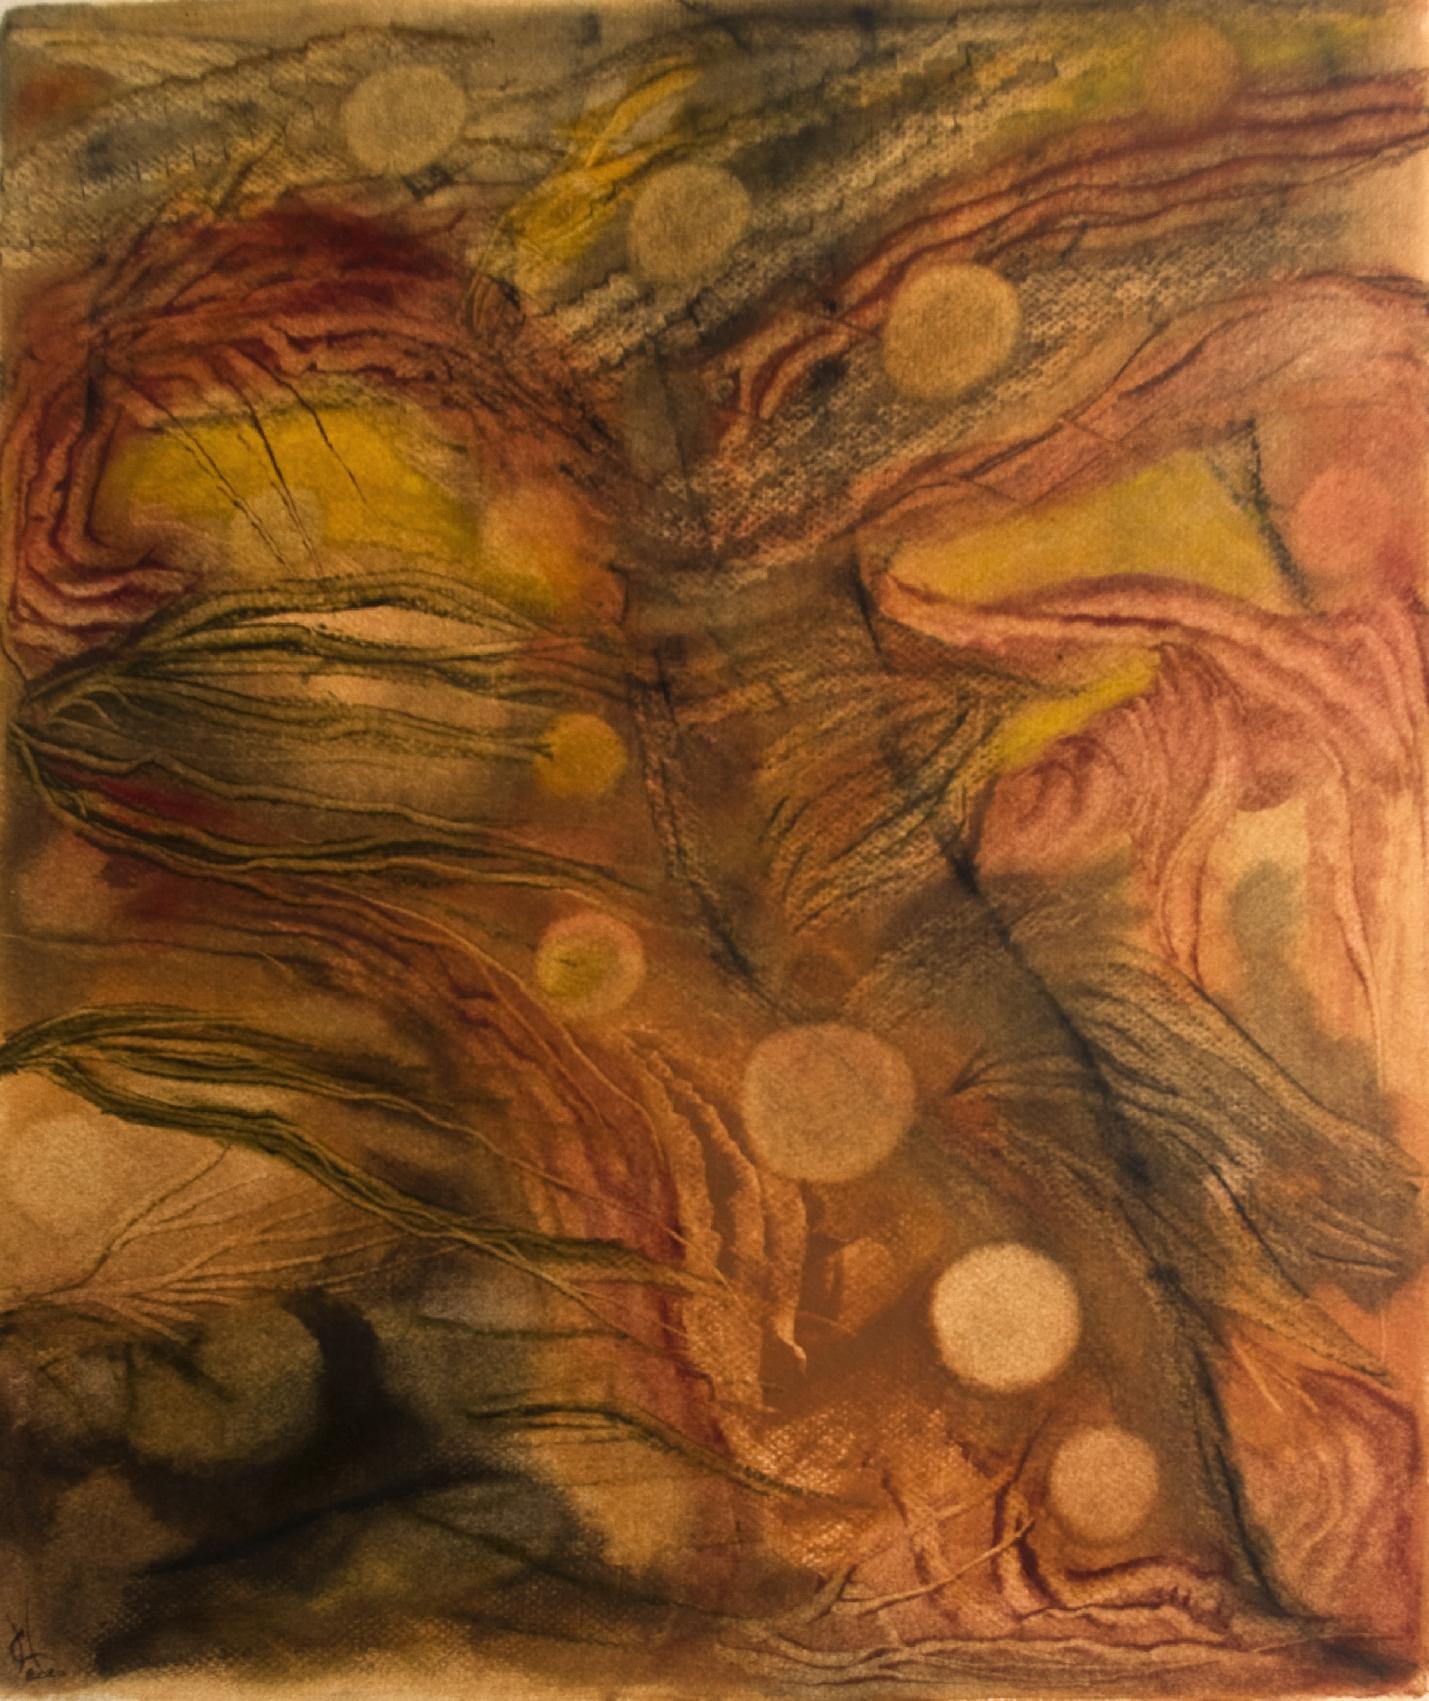 Organics 36 x 36 cm